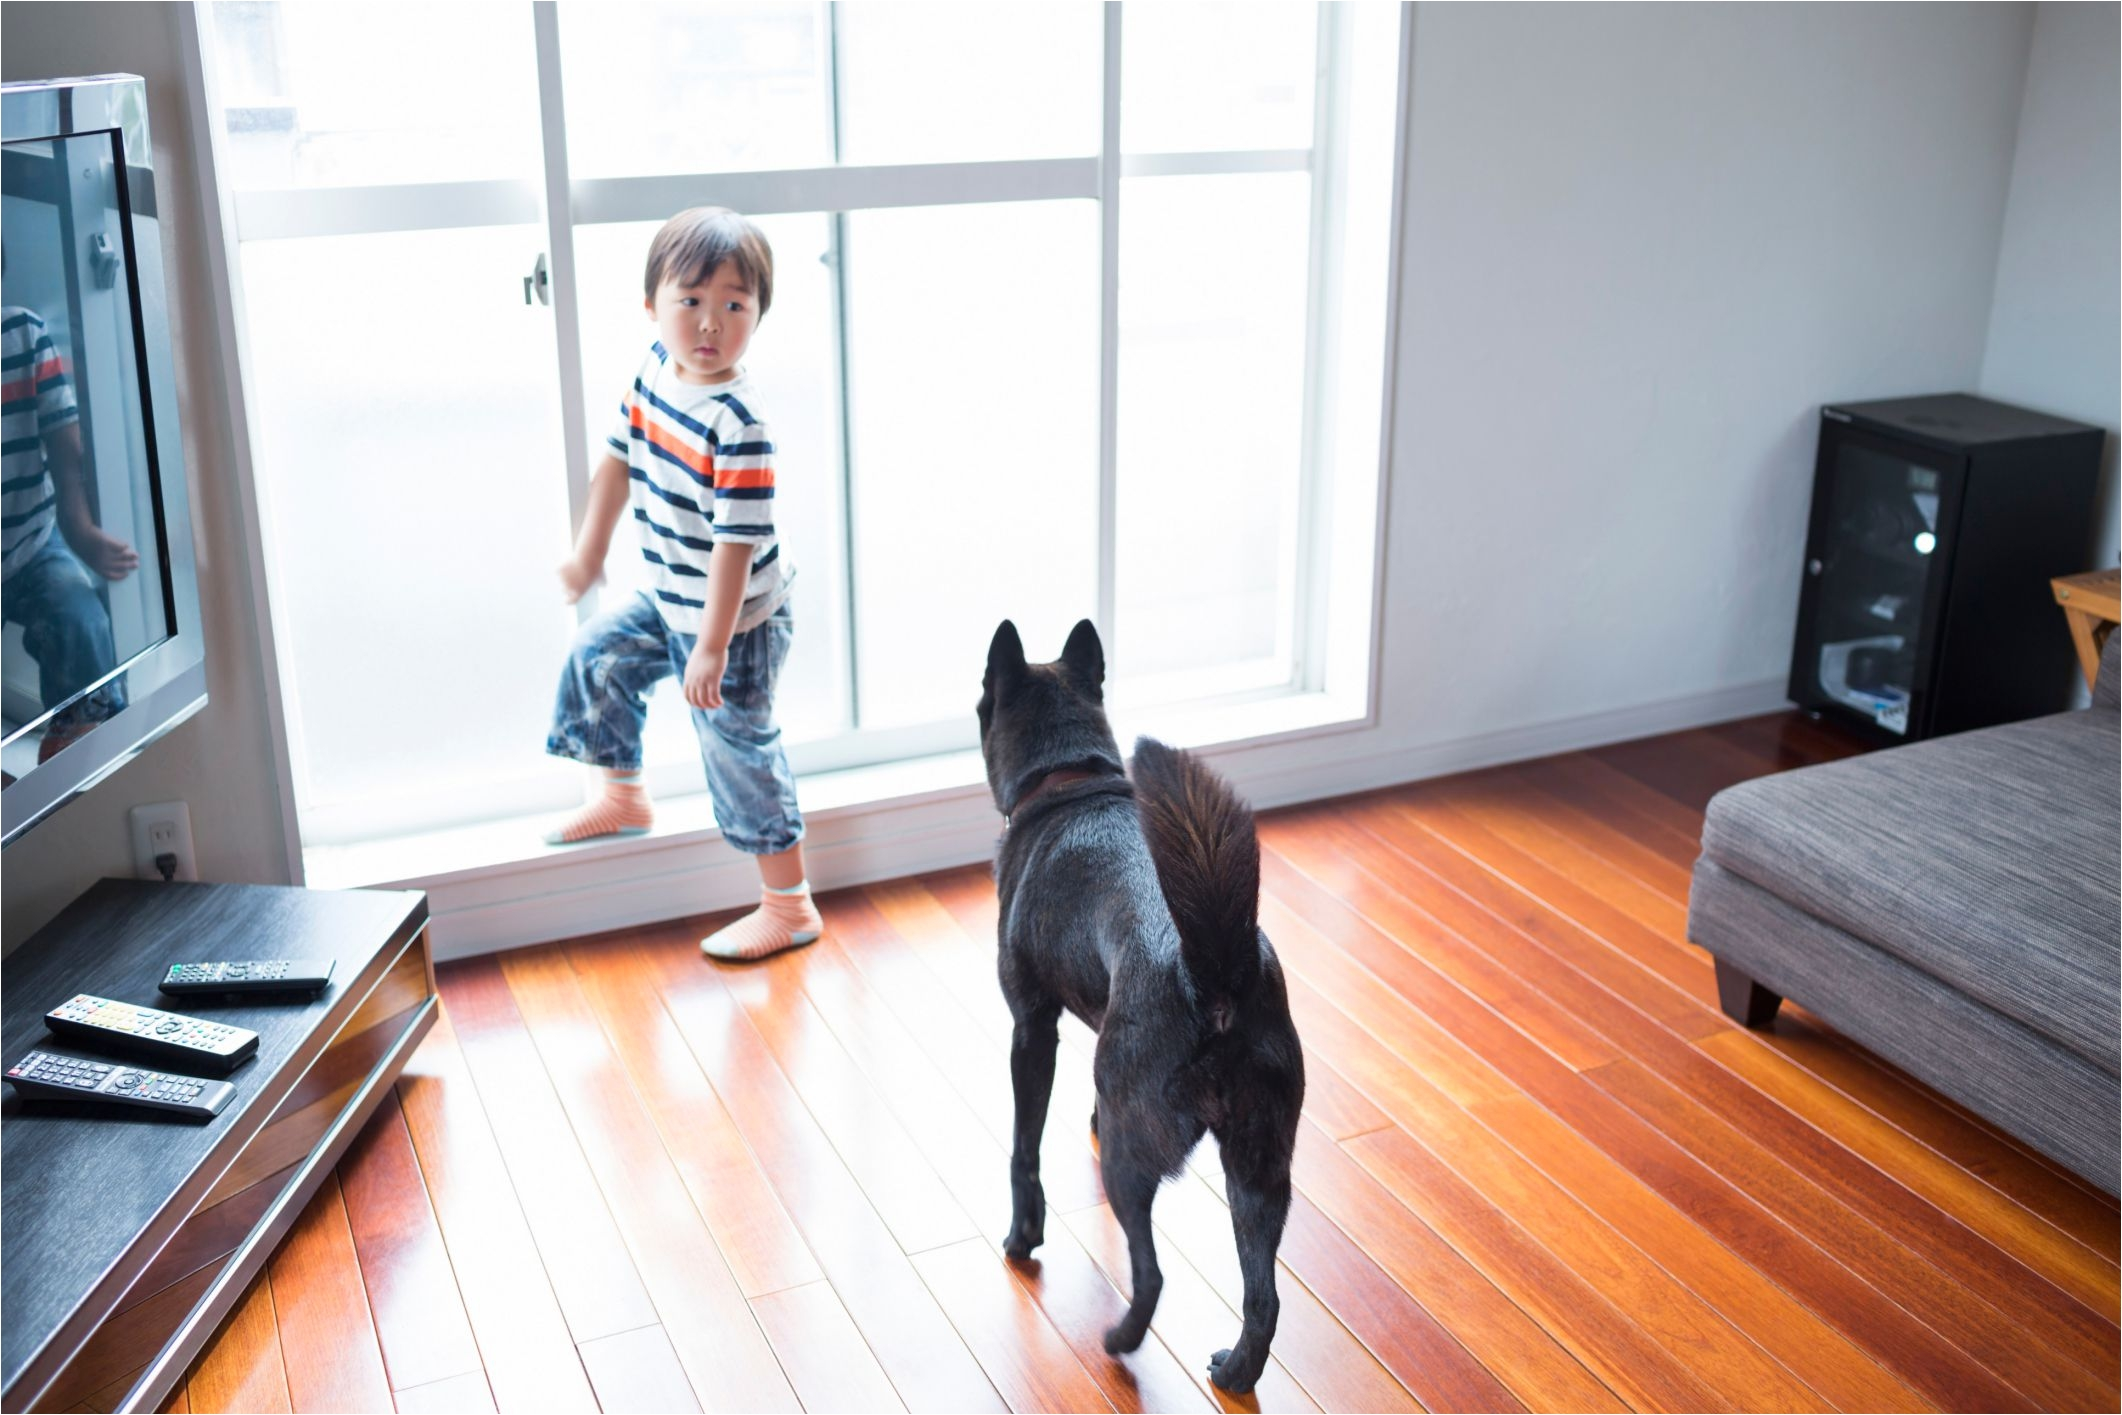 dog on wooden floor 465892145 56a4a1705f9b58b7d0d7e64e jpg